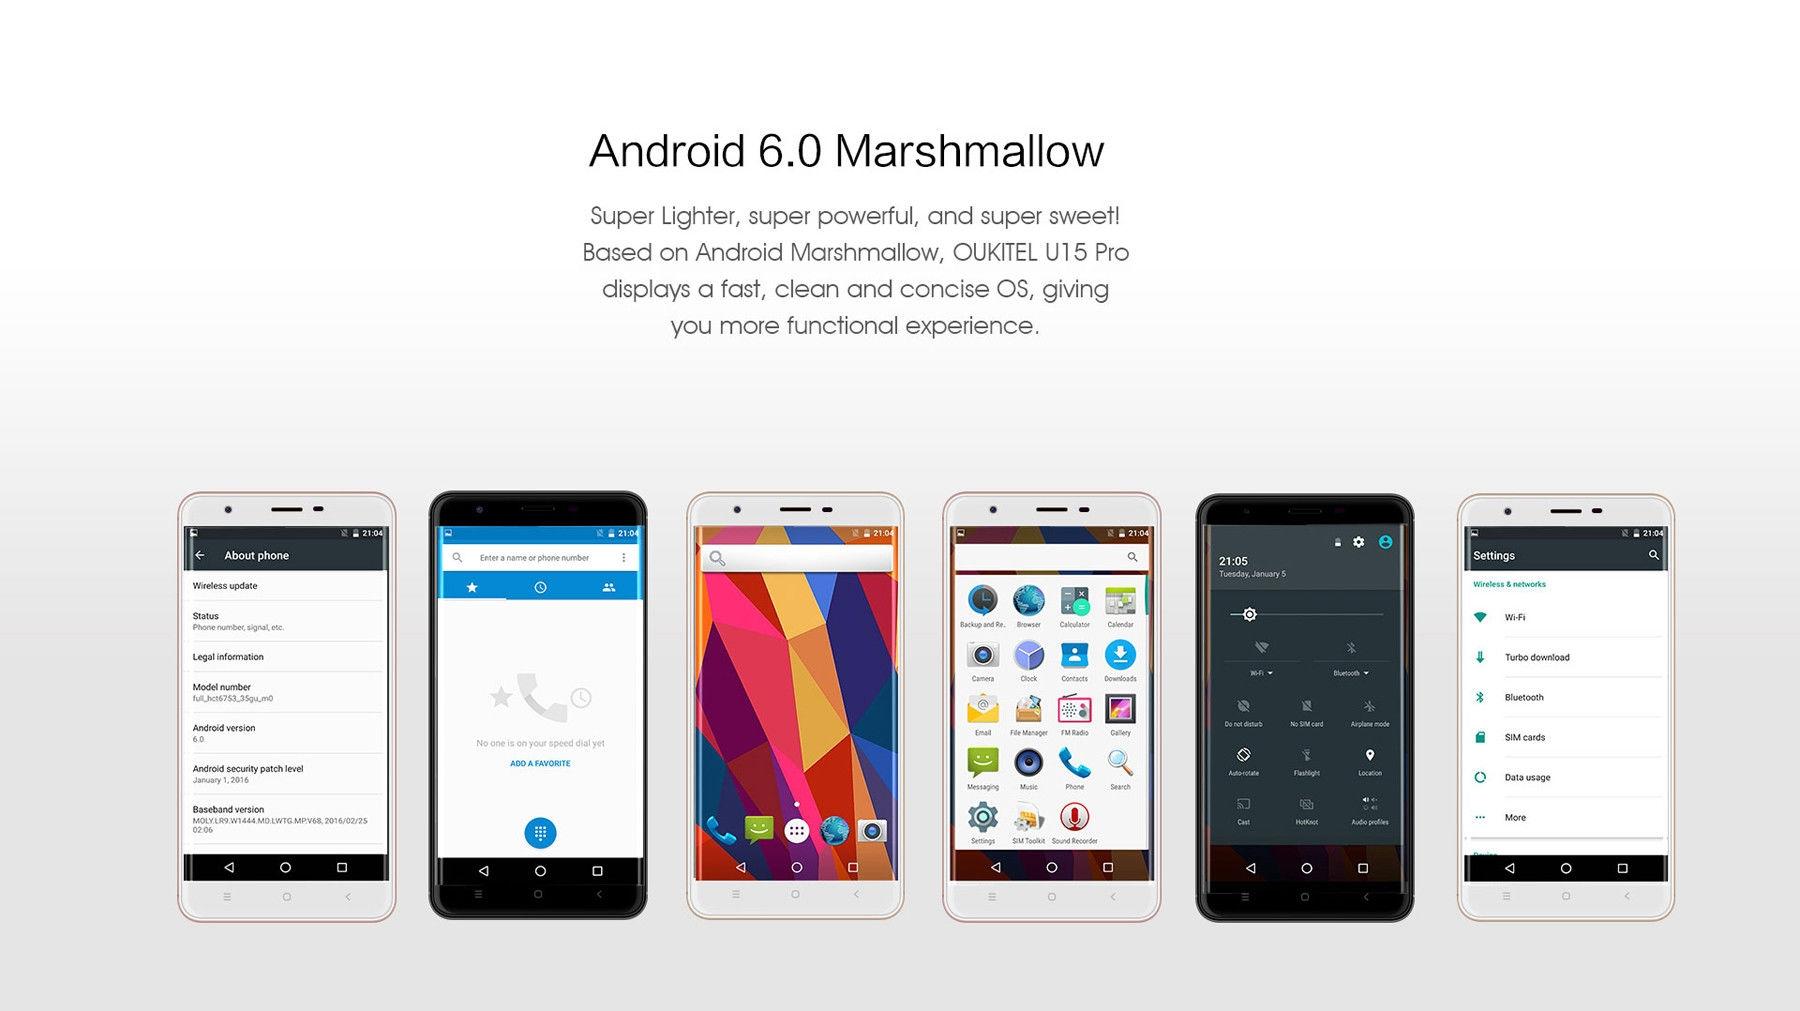 Oukitel U15 Pro Android 6.0 5.5 inch 4G Phablet MTK6753 Octa Core 1.3GHz 3GB RAM 32GB ROM 16.0MP Rear Camera Fingerprint Scanner Bluetooth 4.0